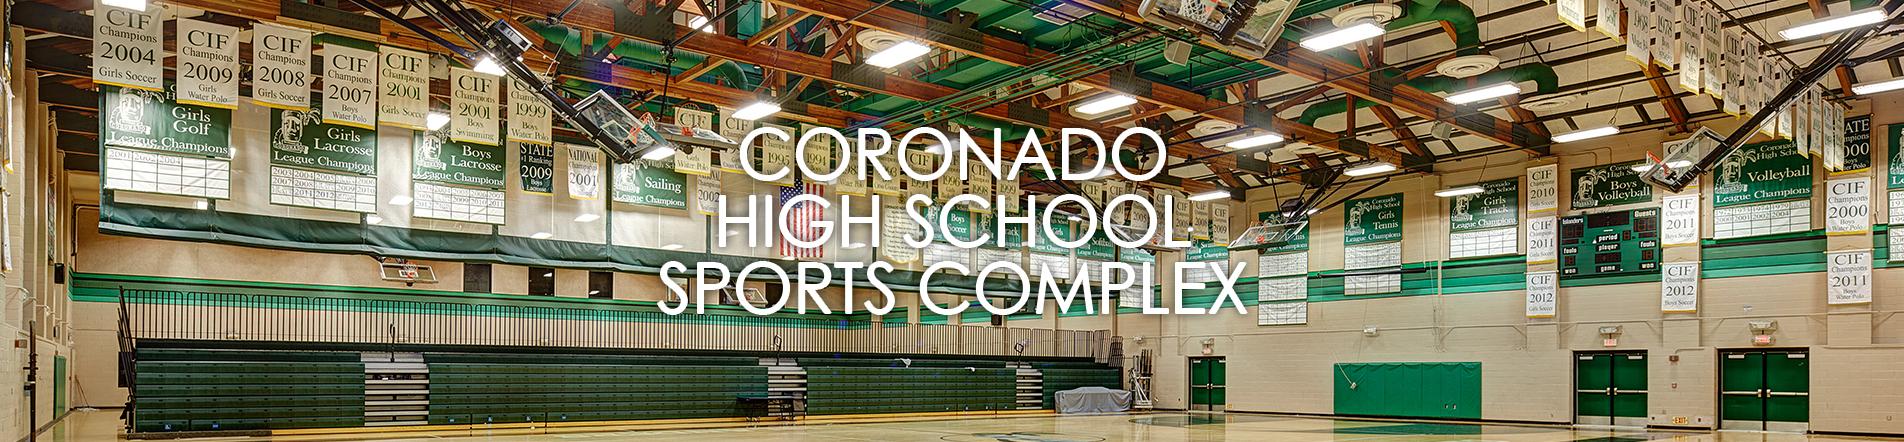 CoronadoSportsHeader_COL.jpg